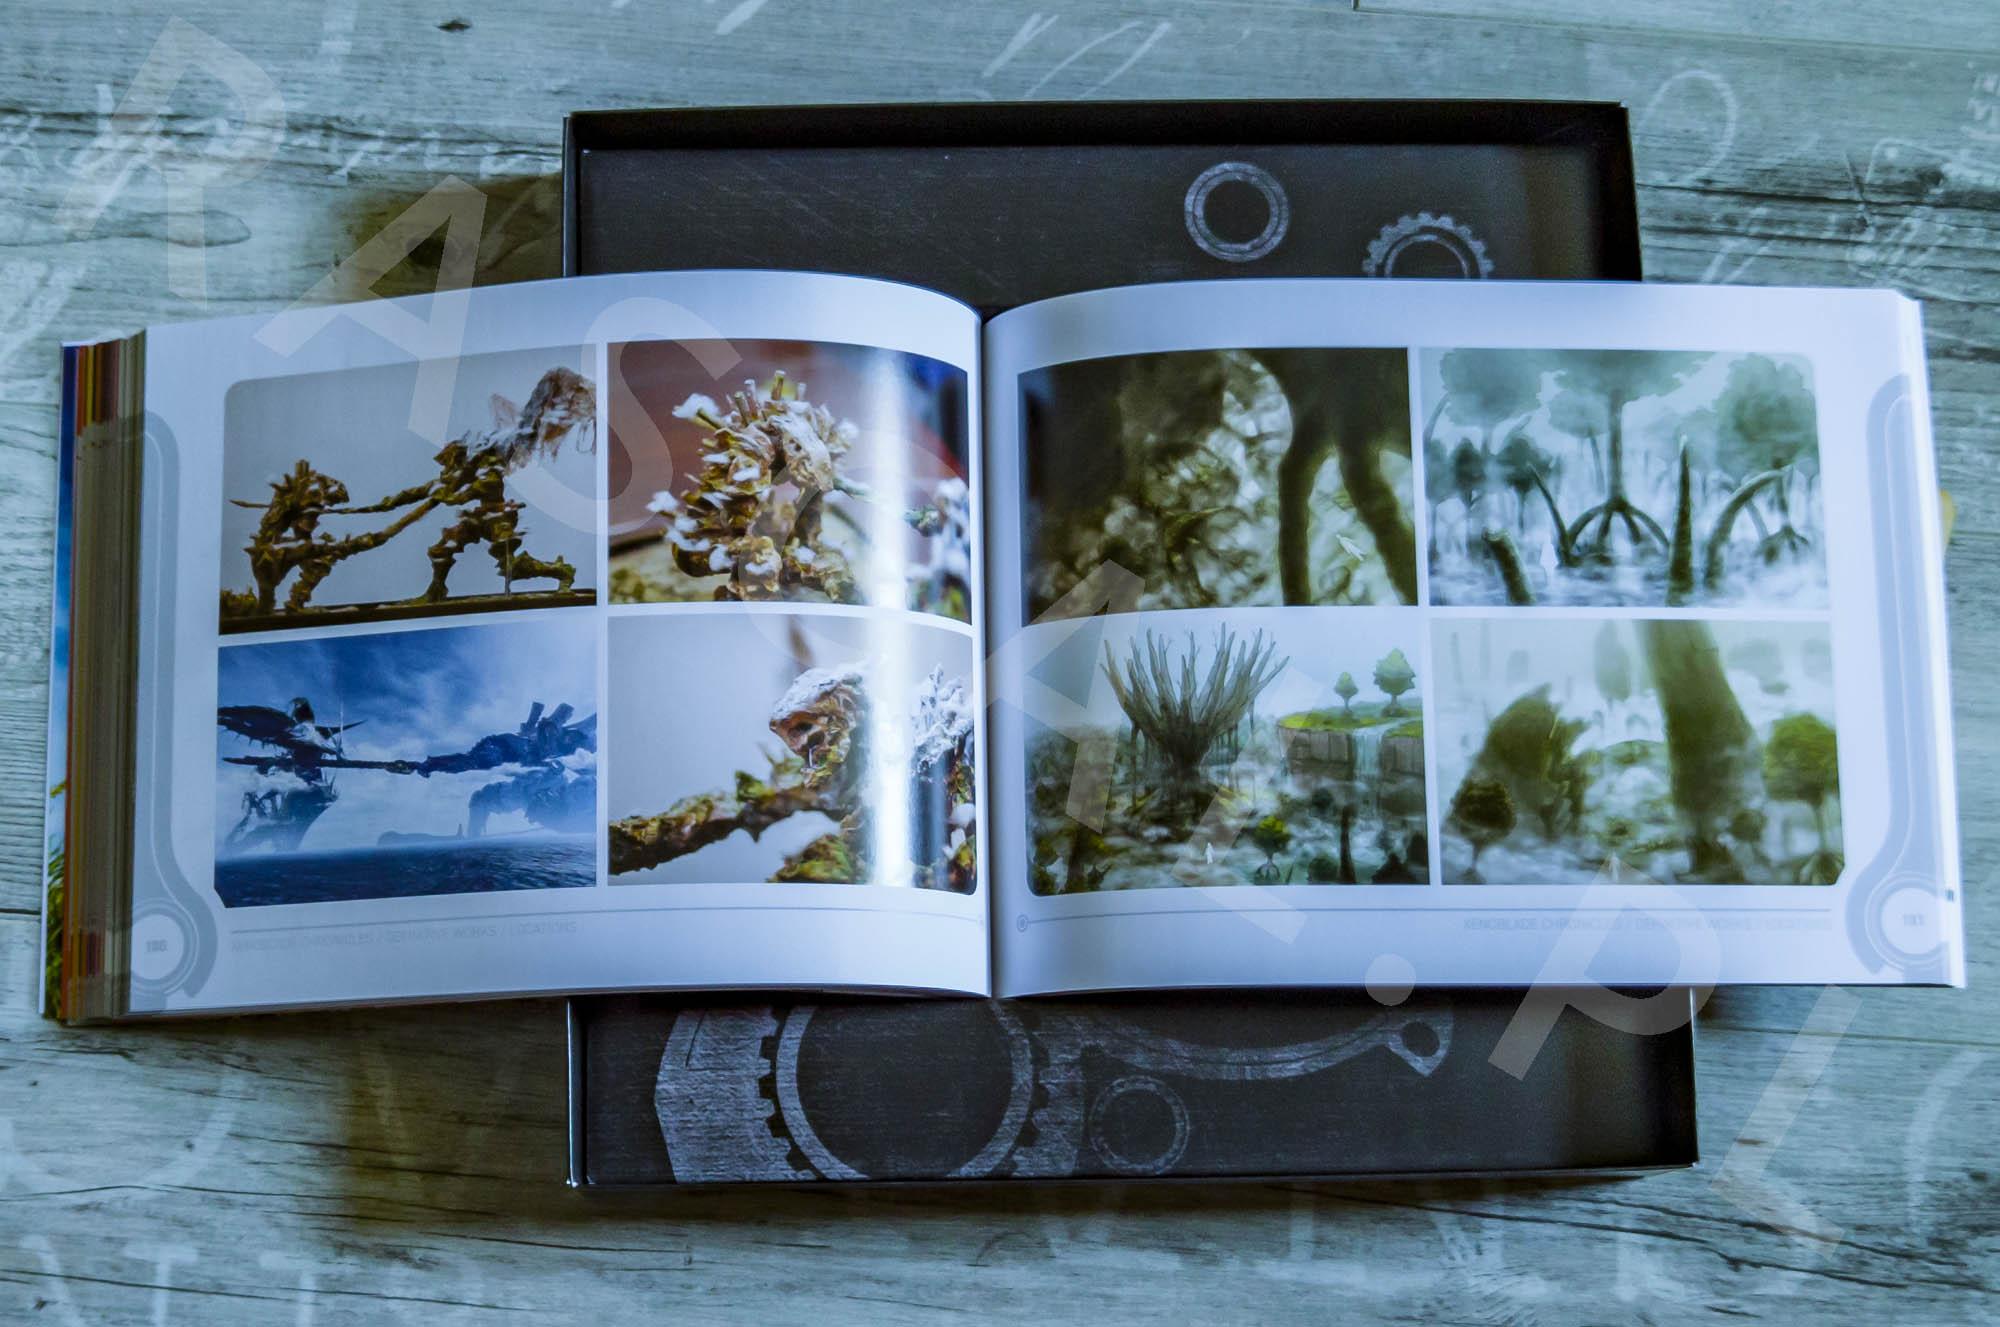 Xenoblade Chronicles Definitive Edition Collectors Set - Artbook - 21 - Lokacje